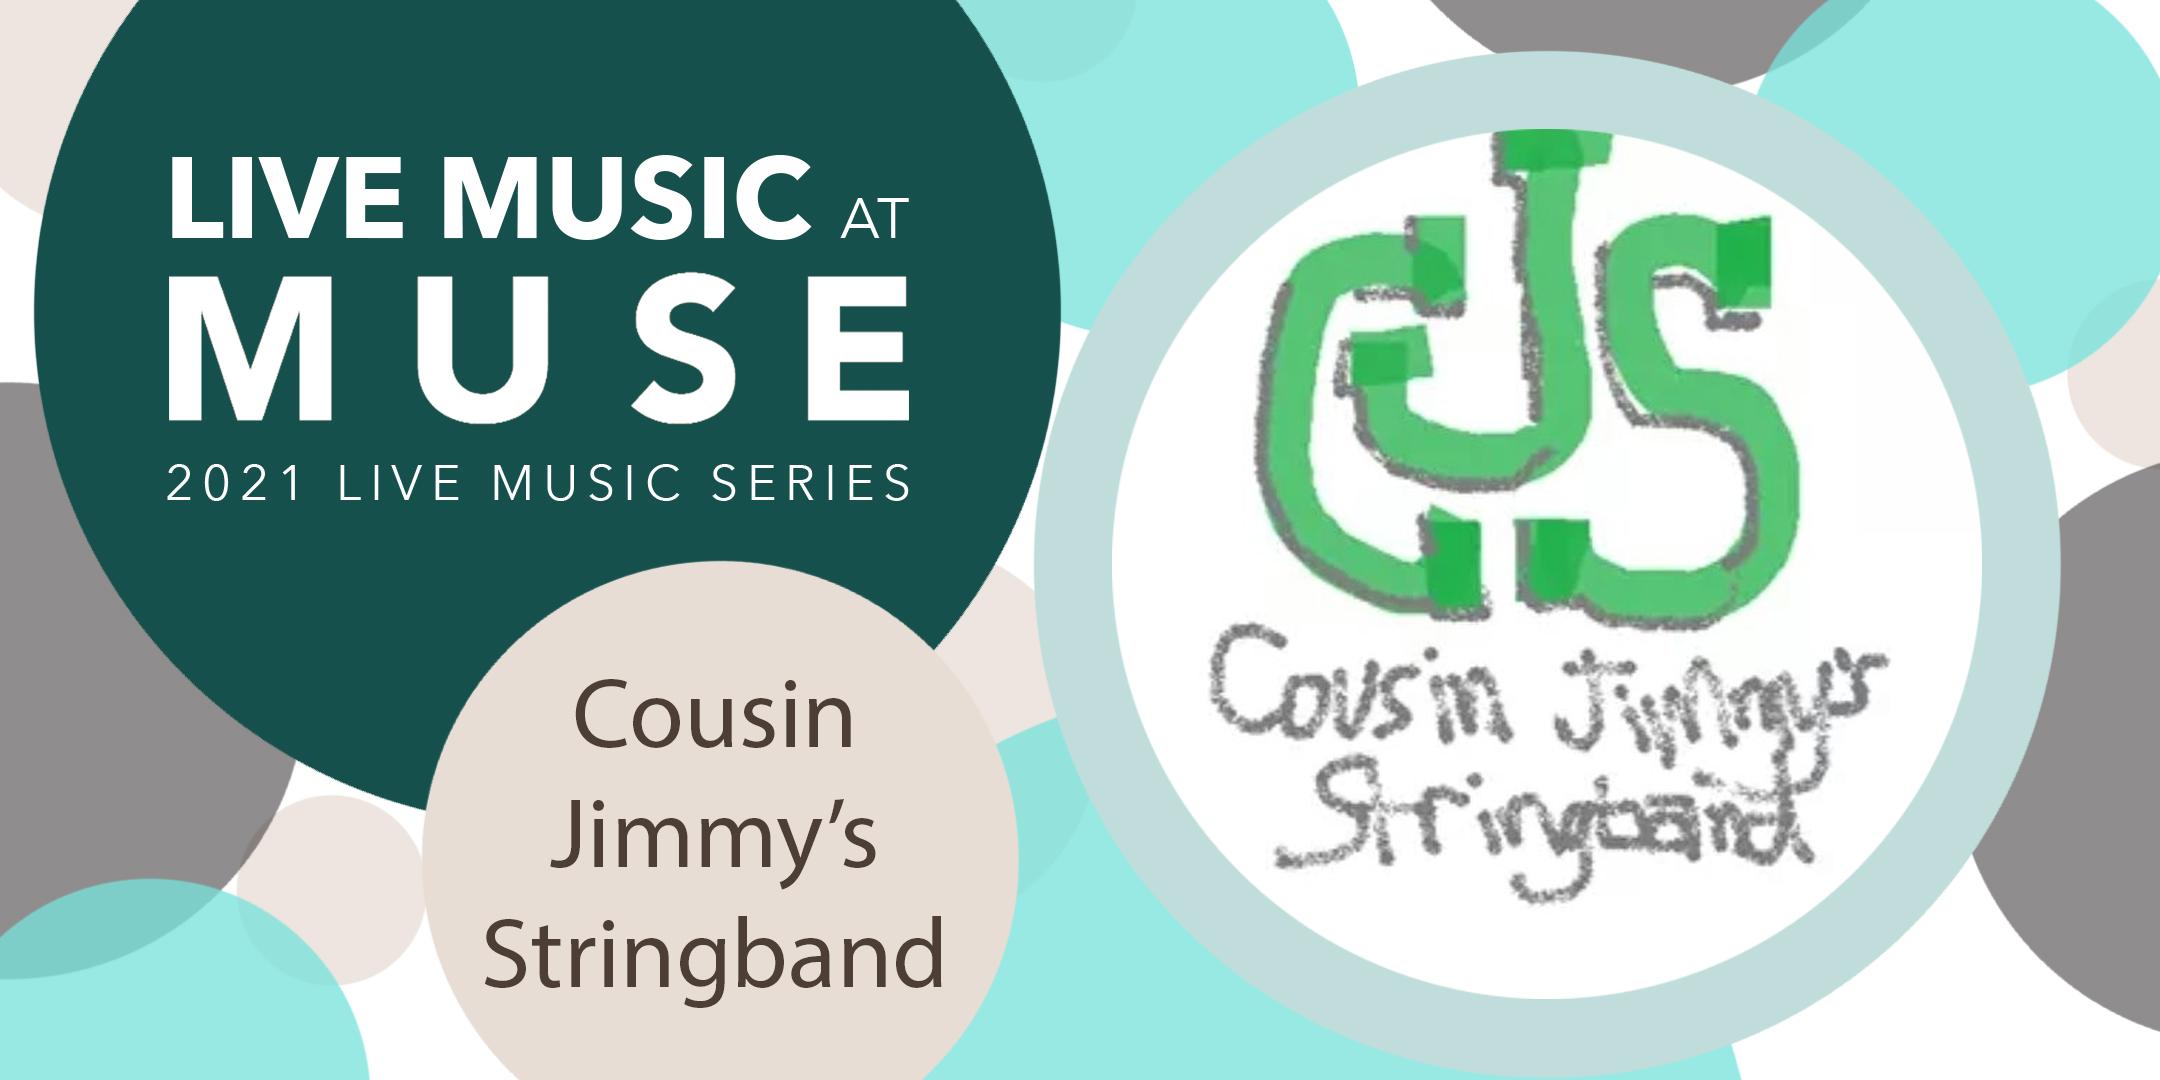 Cousin Jimmy's Stringband